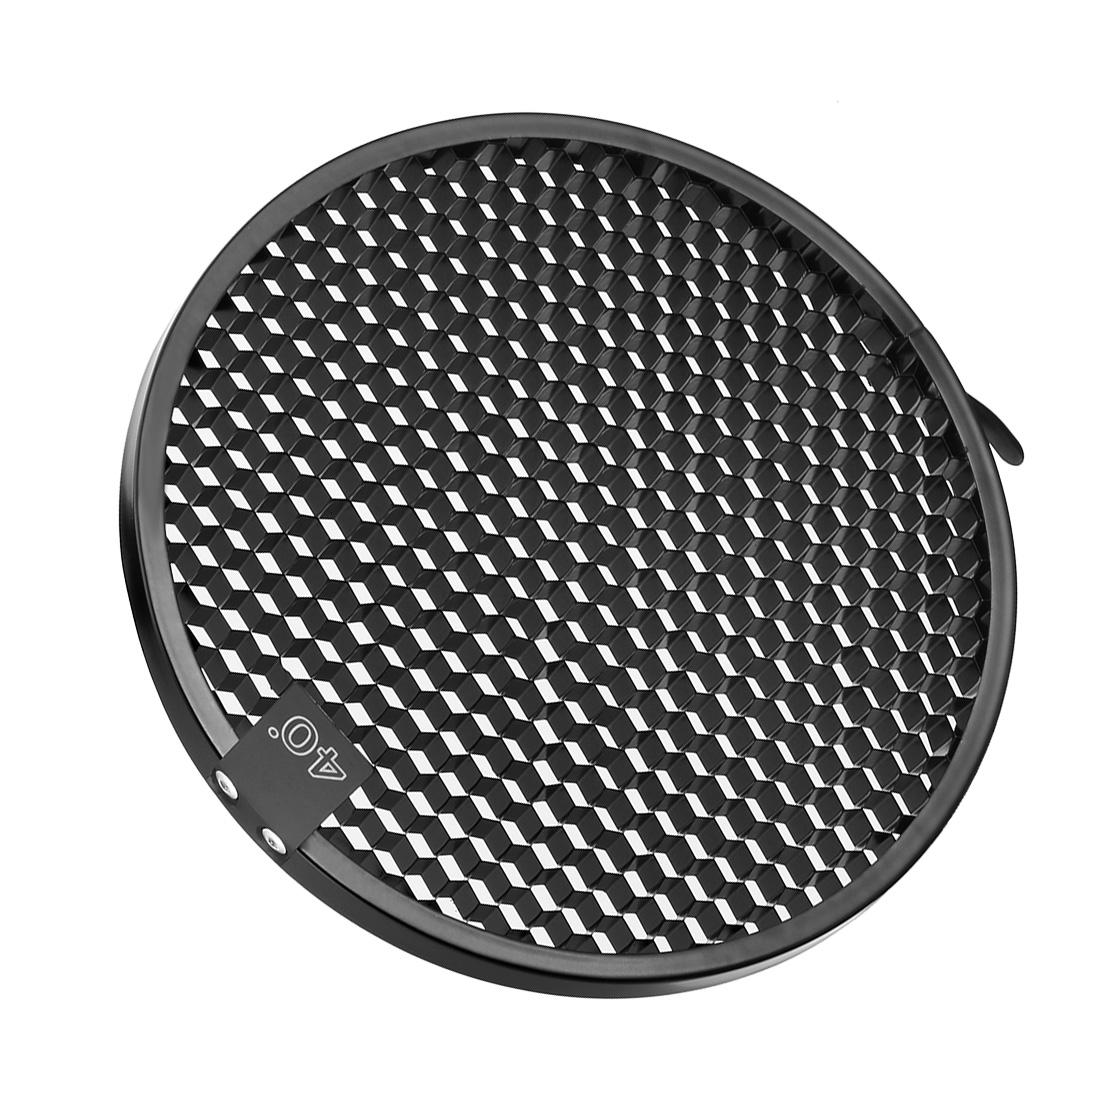 40 Degree Honeycomb Grid Black for 7-inch Reflector Diffuser Lamp Shade Dish